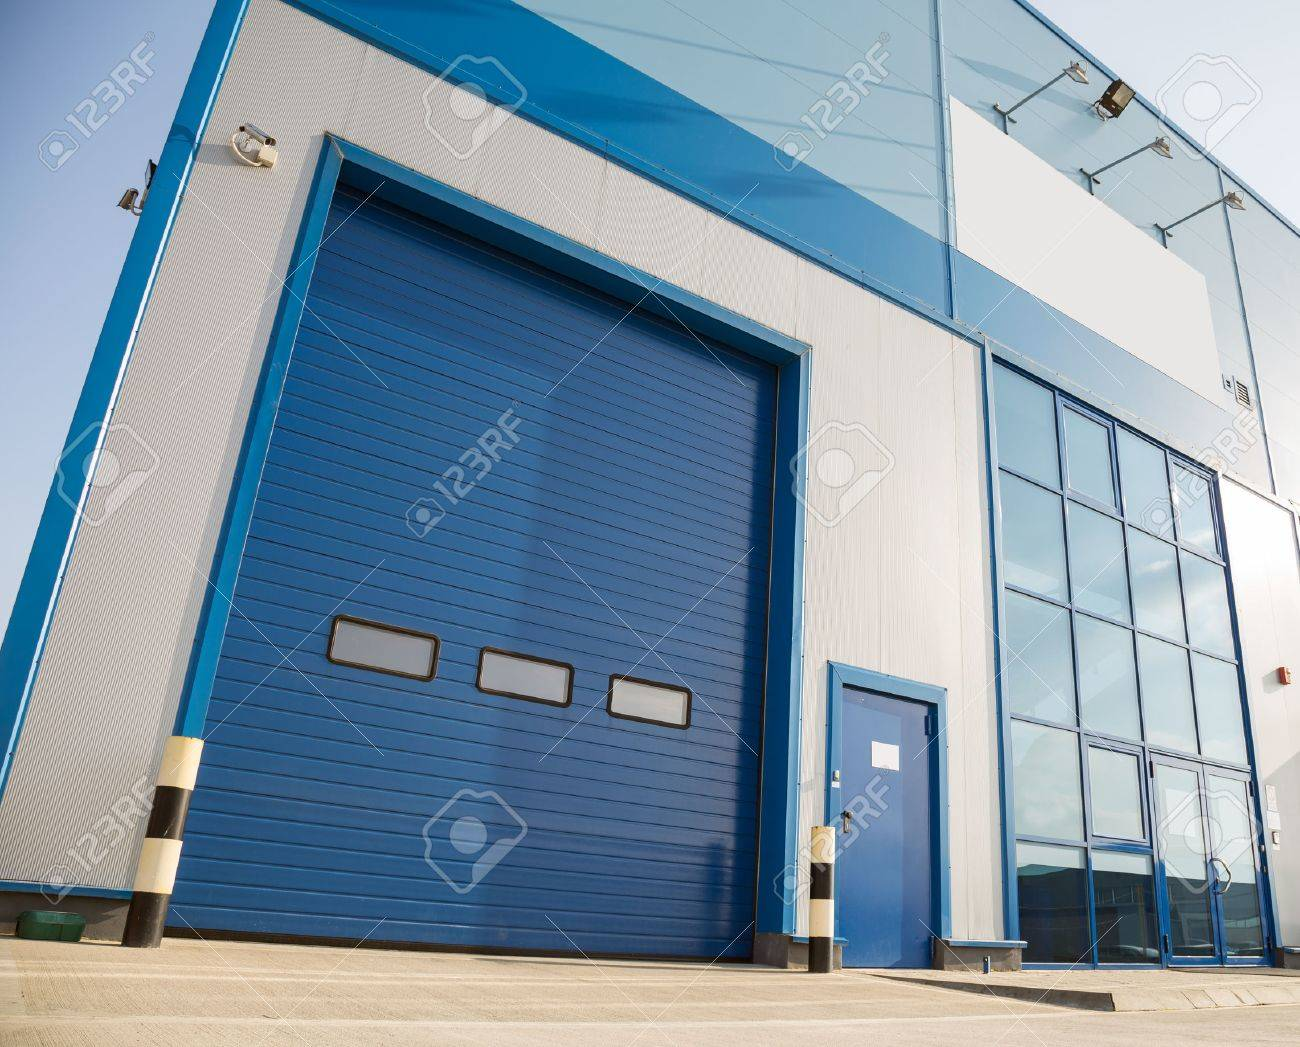 bâtiment industriel moderne avec grande porte de garage bleu banque